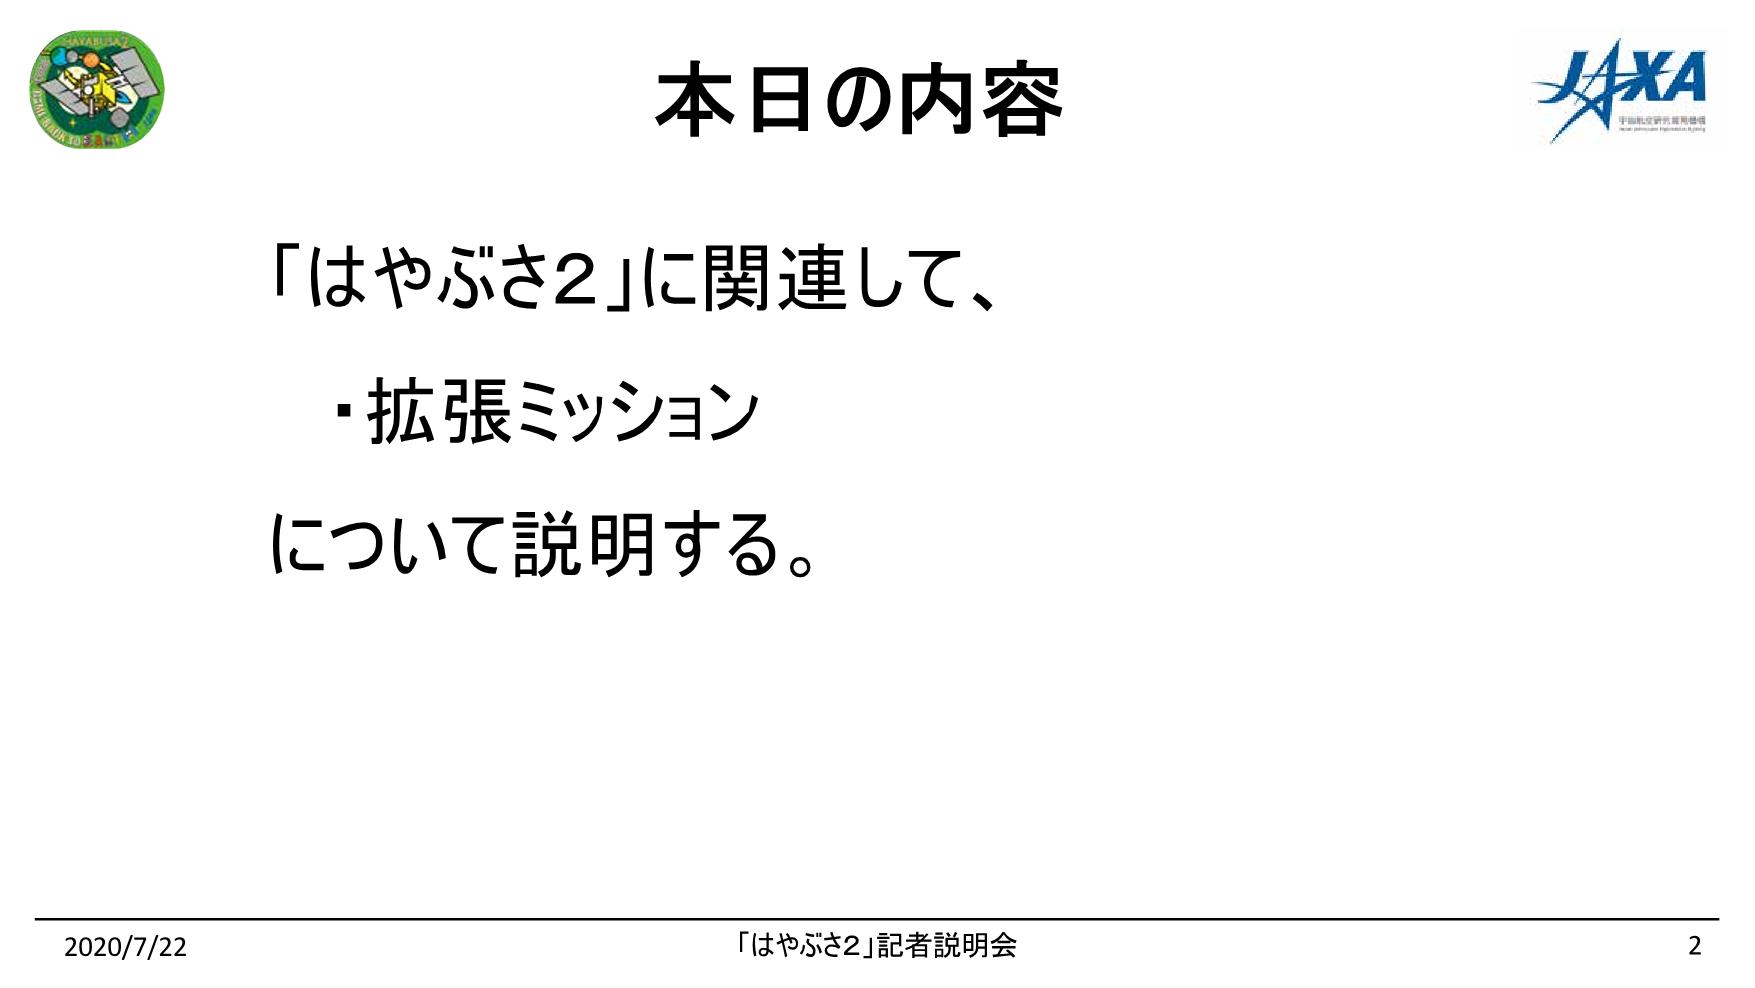 f:id:Imamura:20200722140622p:plain